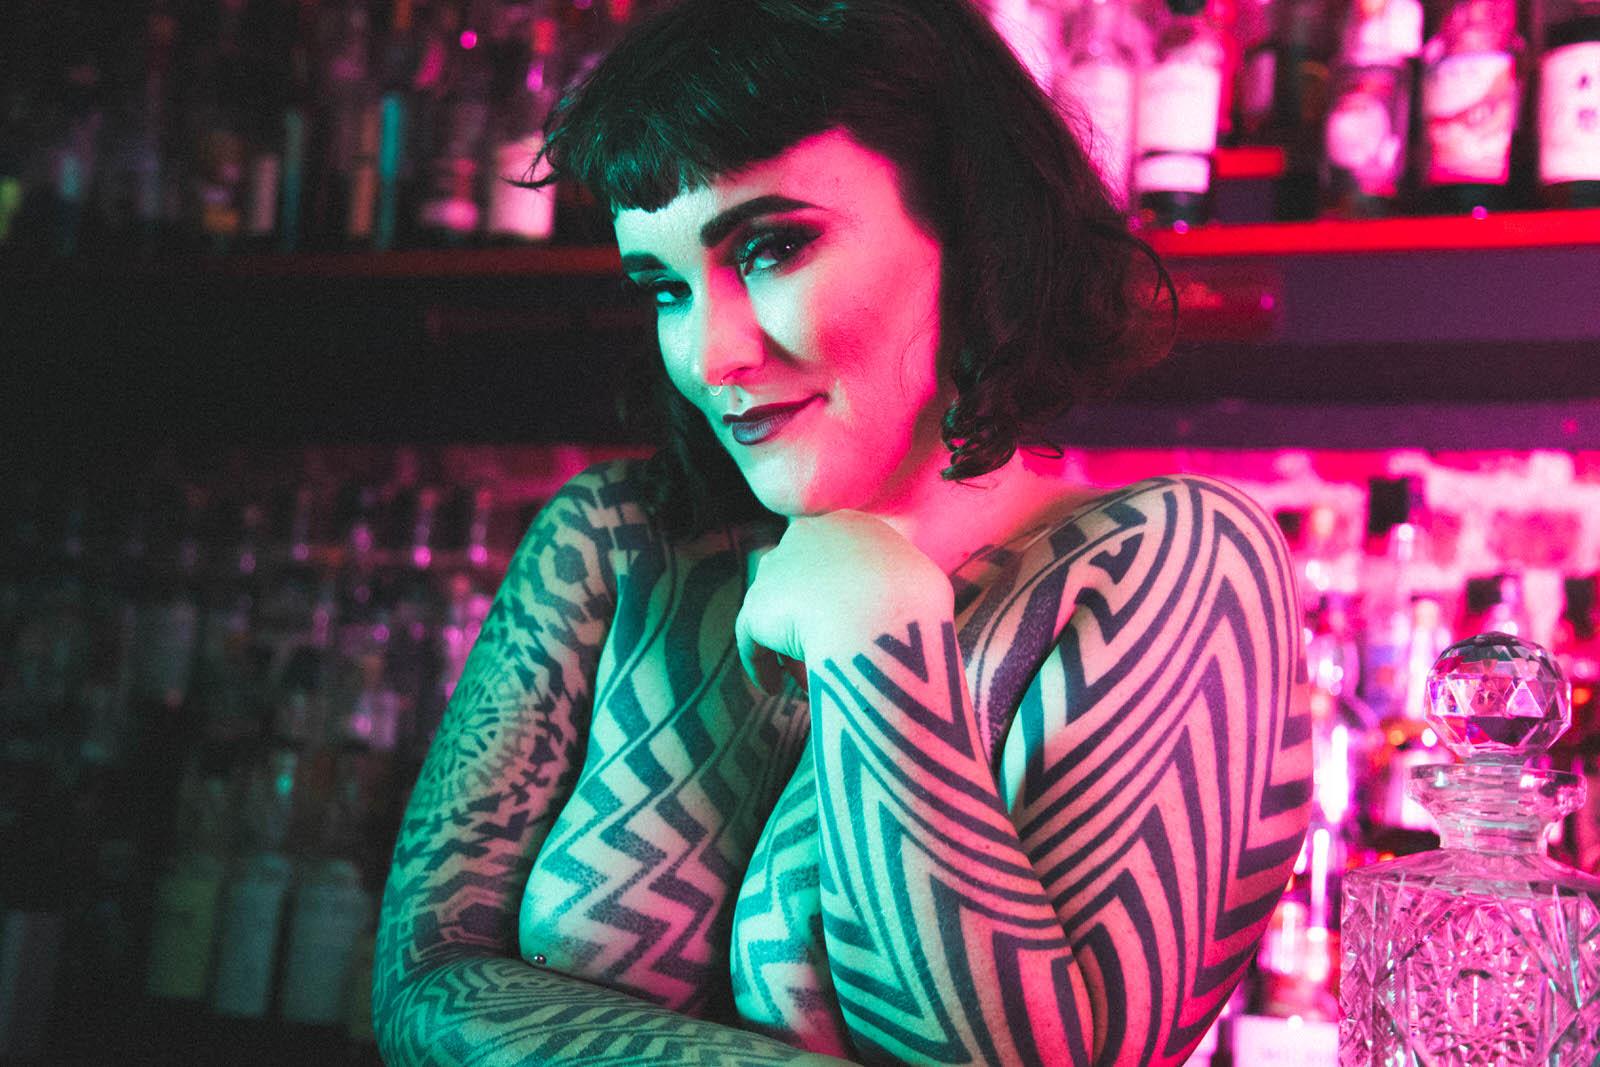 miss tallula nudist, naturalist, naked whisky date, naked dominatrix, tattooed dominatrix, alternative model